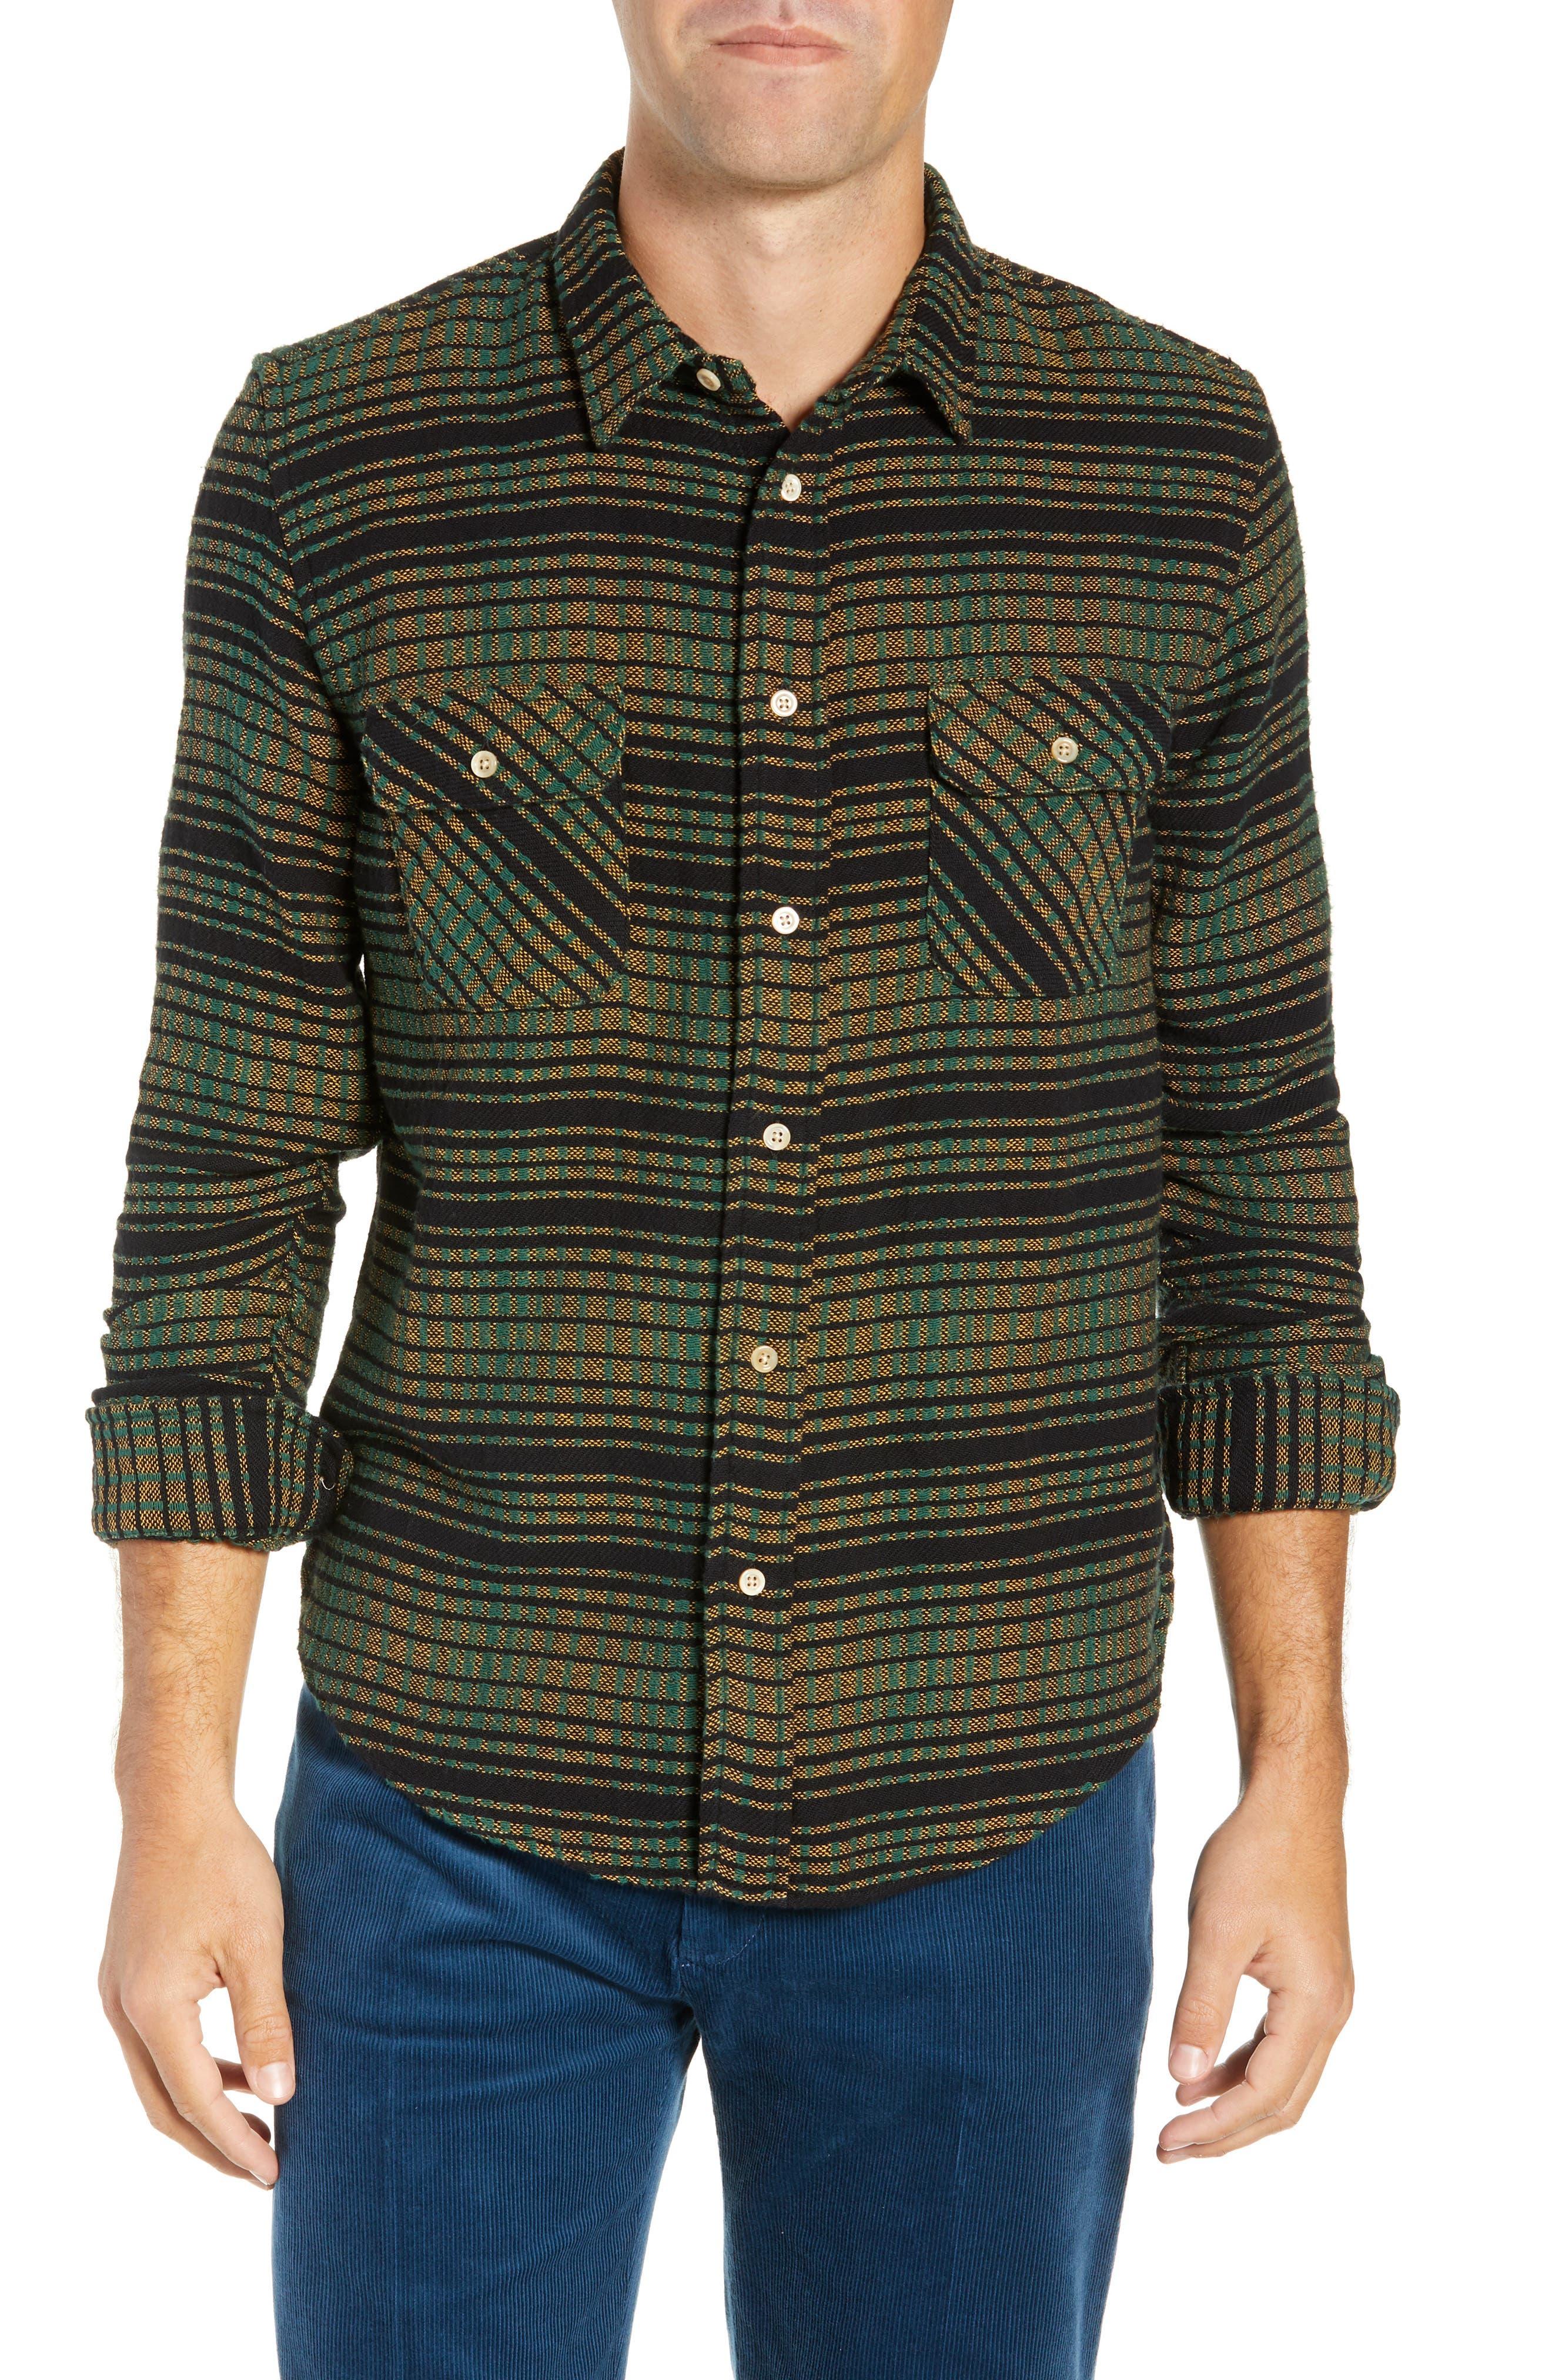 LEVI'S<SUP>®</SUP> VINTAGE CLOTHING Shorthorn Slim Fit Sport Shirt, Main, color, 300